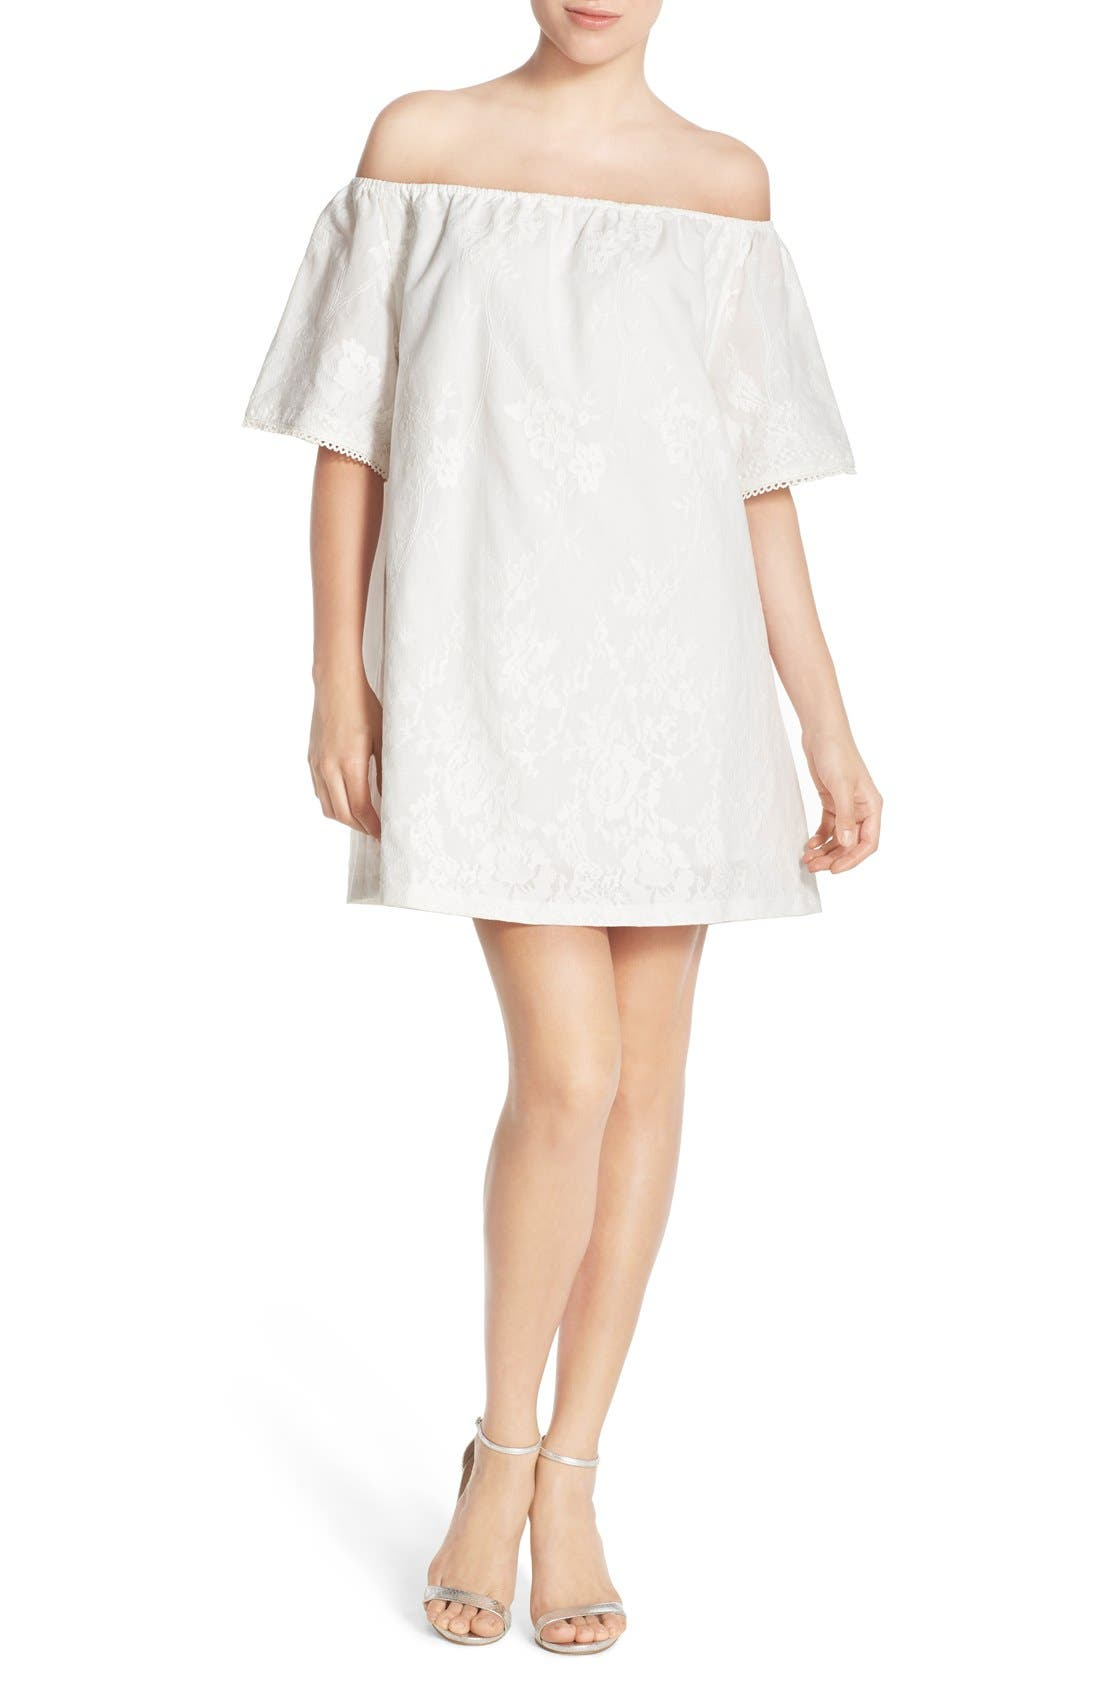 Main Image - BB Dakota 'Manda' Off the Shoulder Cotton Shift Dress